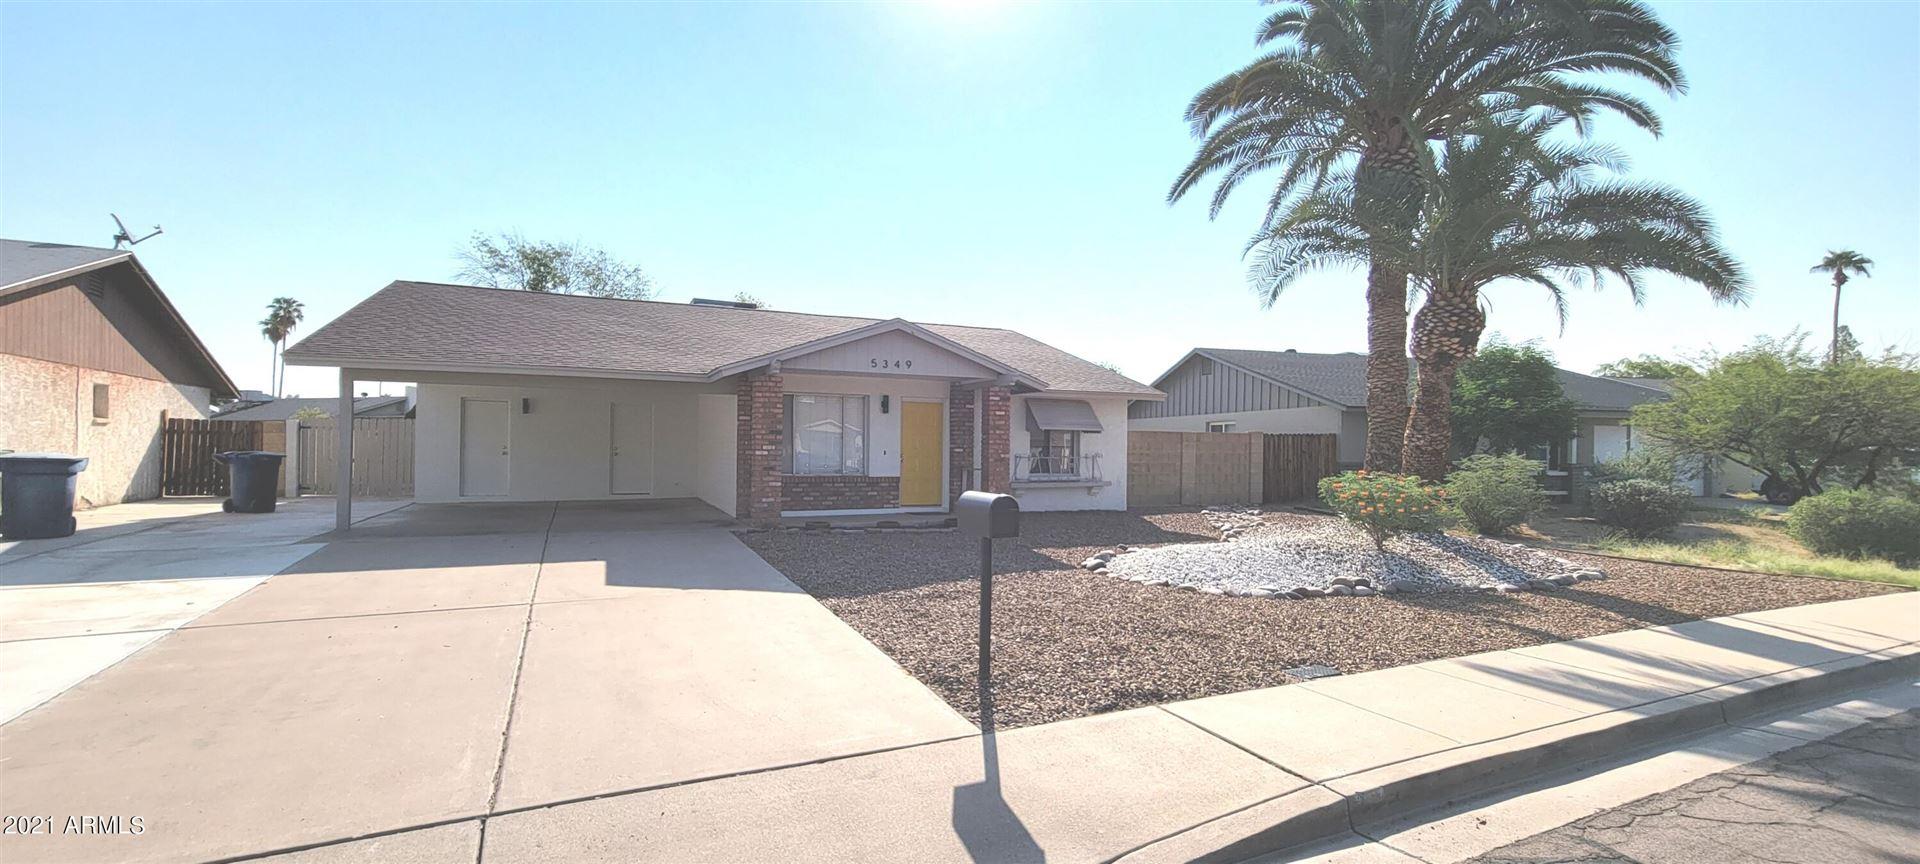 Photo of 5349 S RIVER Drive, Tempe, AZ 85283 (MLS # 6294931)